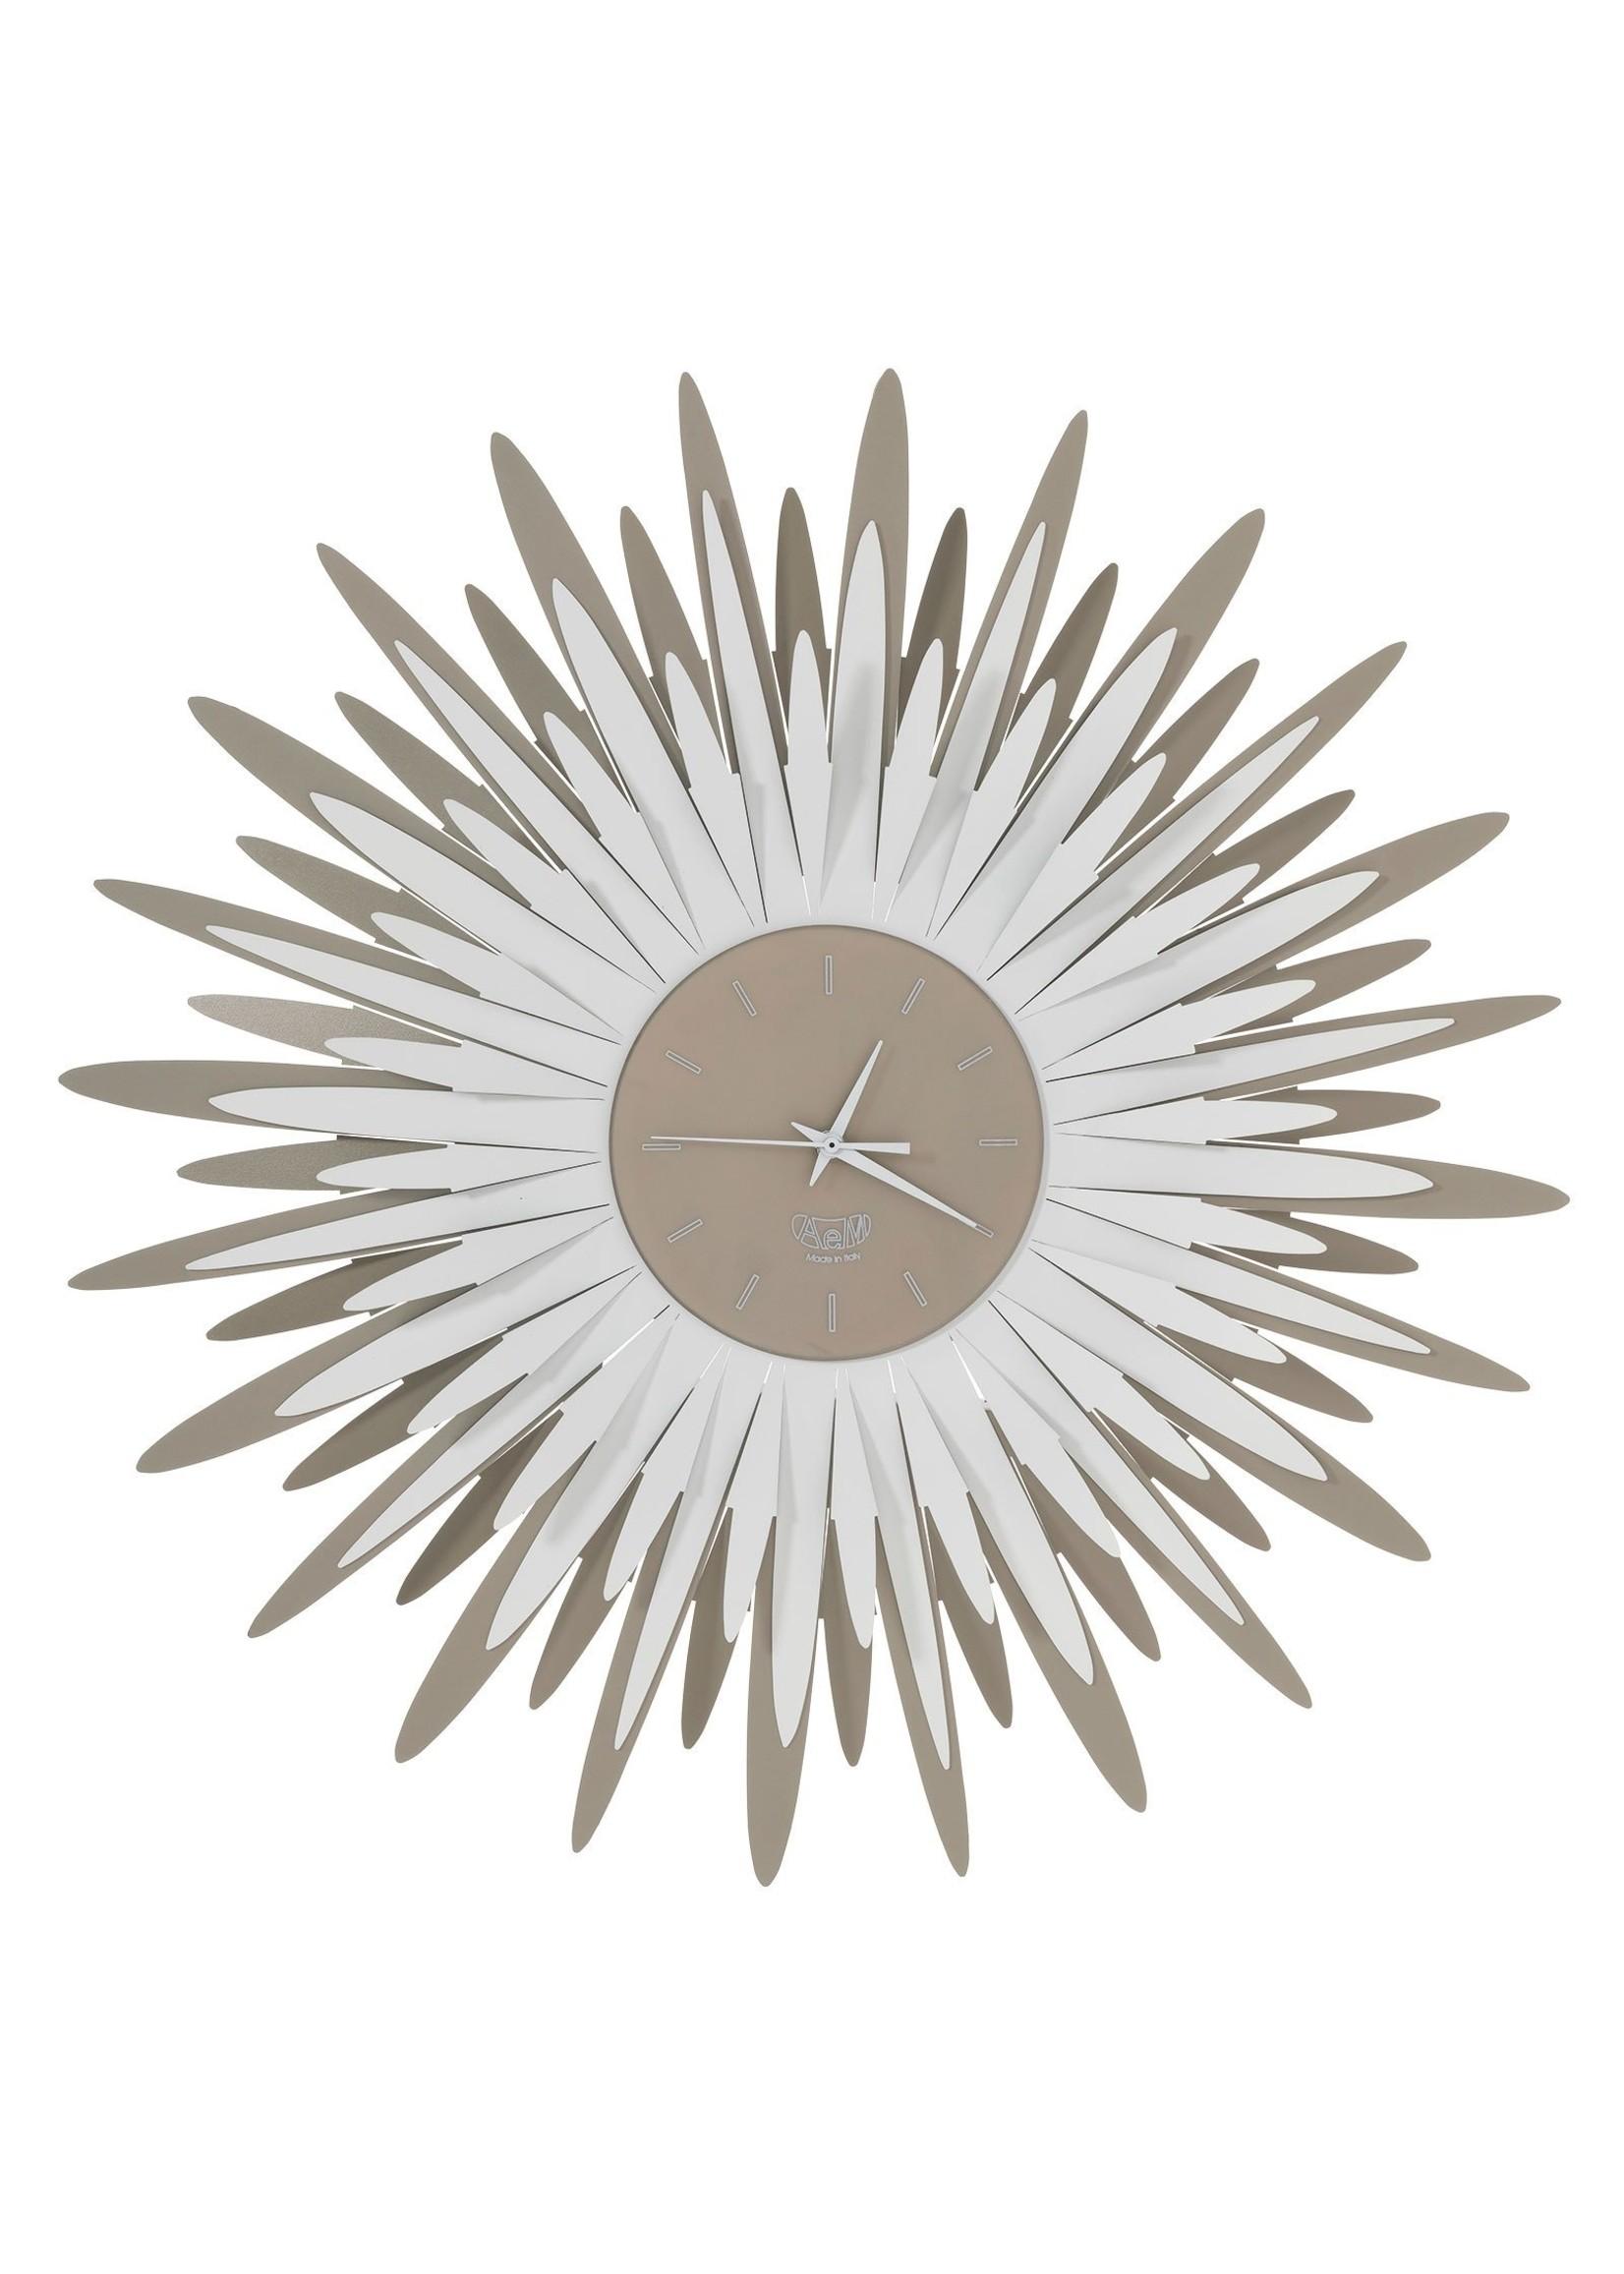 Arti & Mestieri Wandklok Italiaans Design Sting 3073 c143 bronze/ trans gold